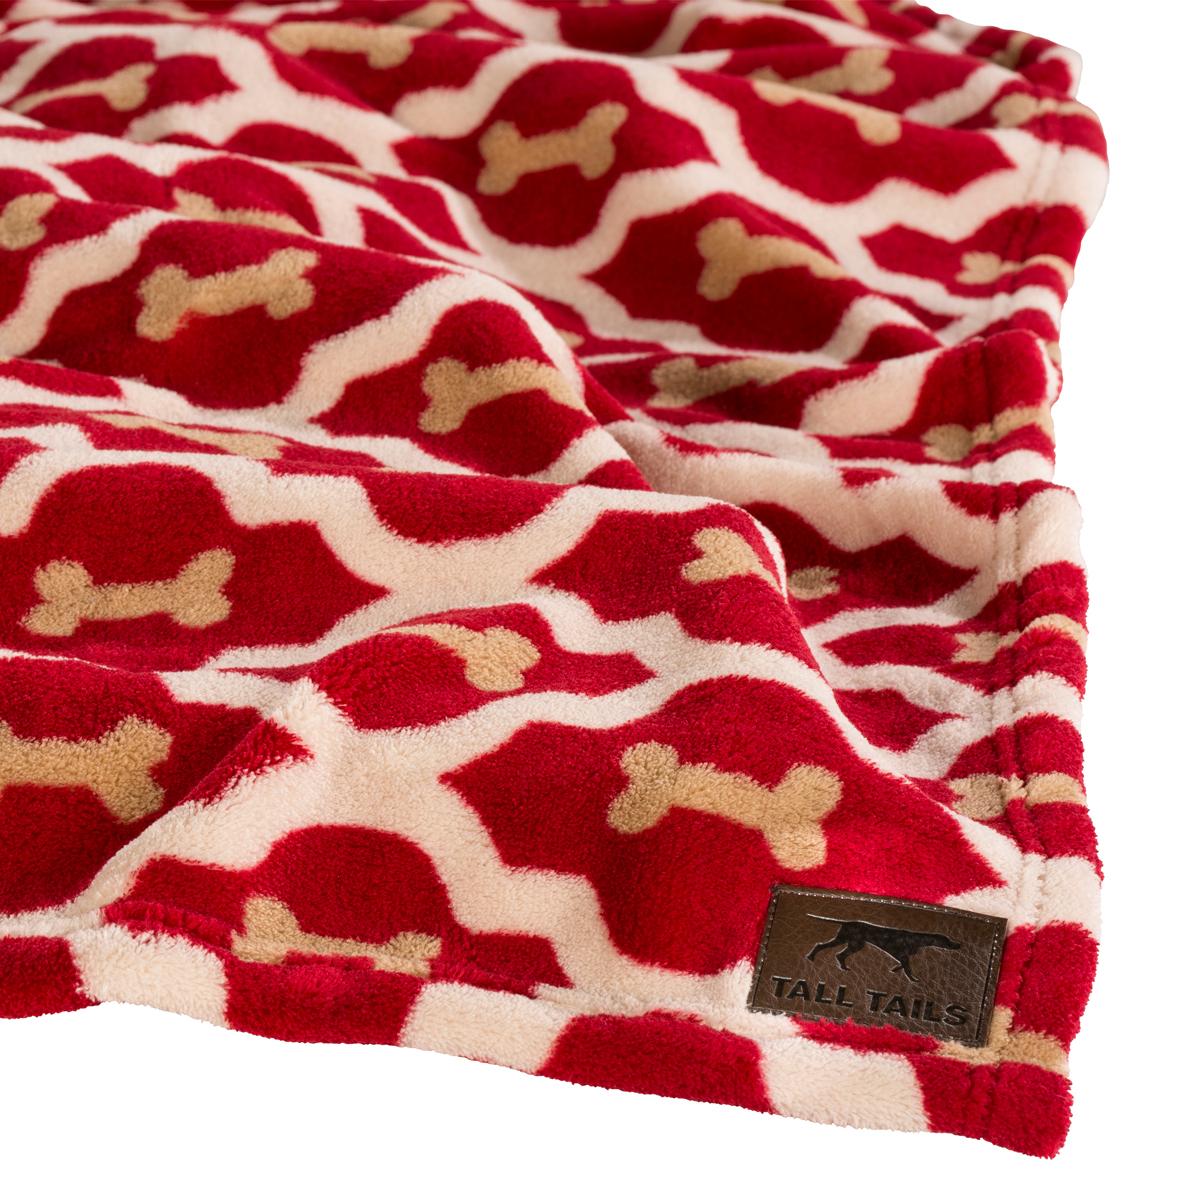 Tall Tails Red Bone Fleece Dog Blanket